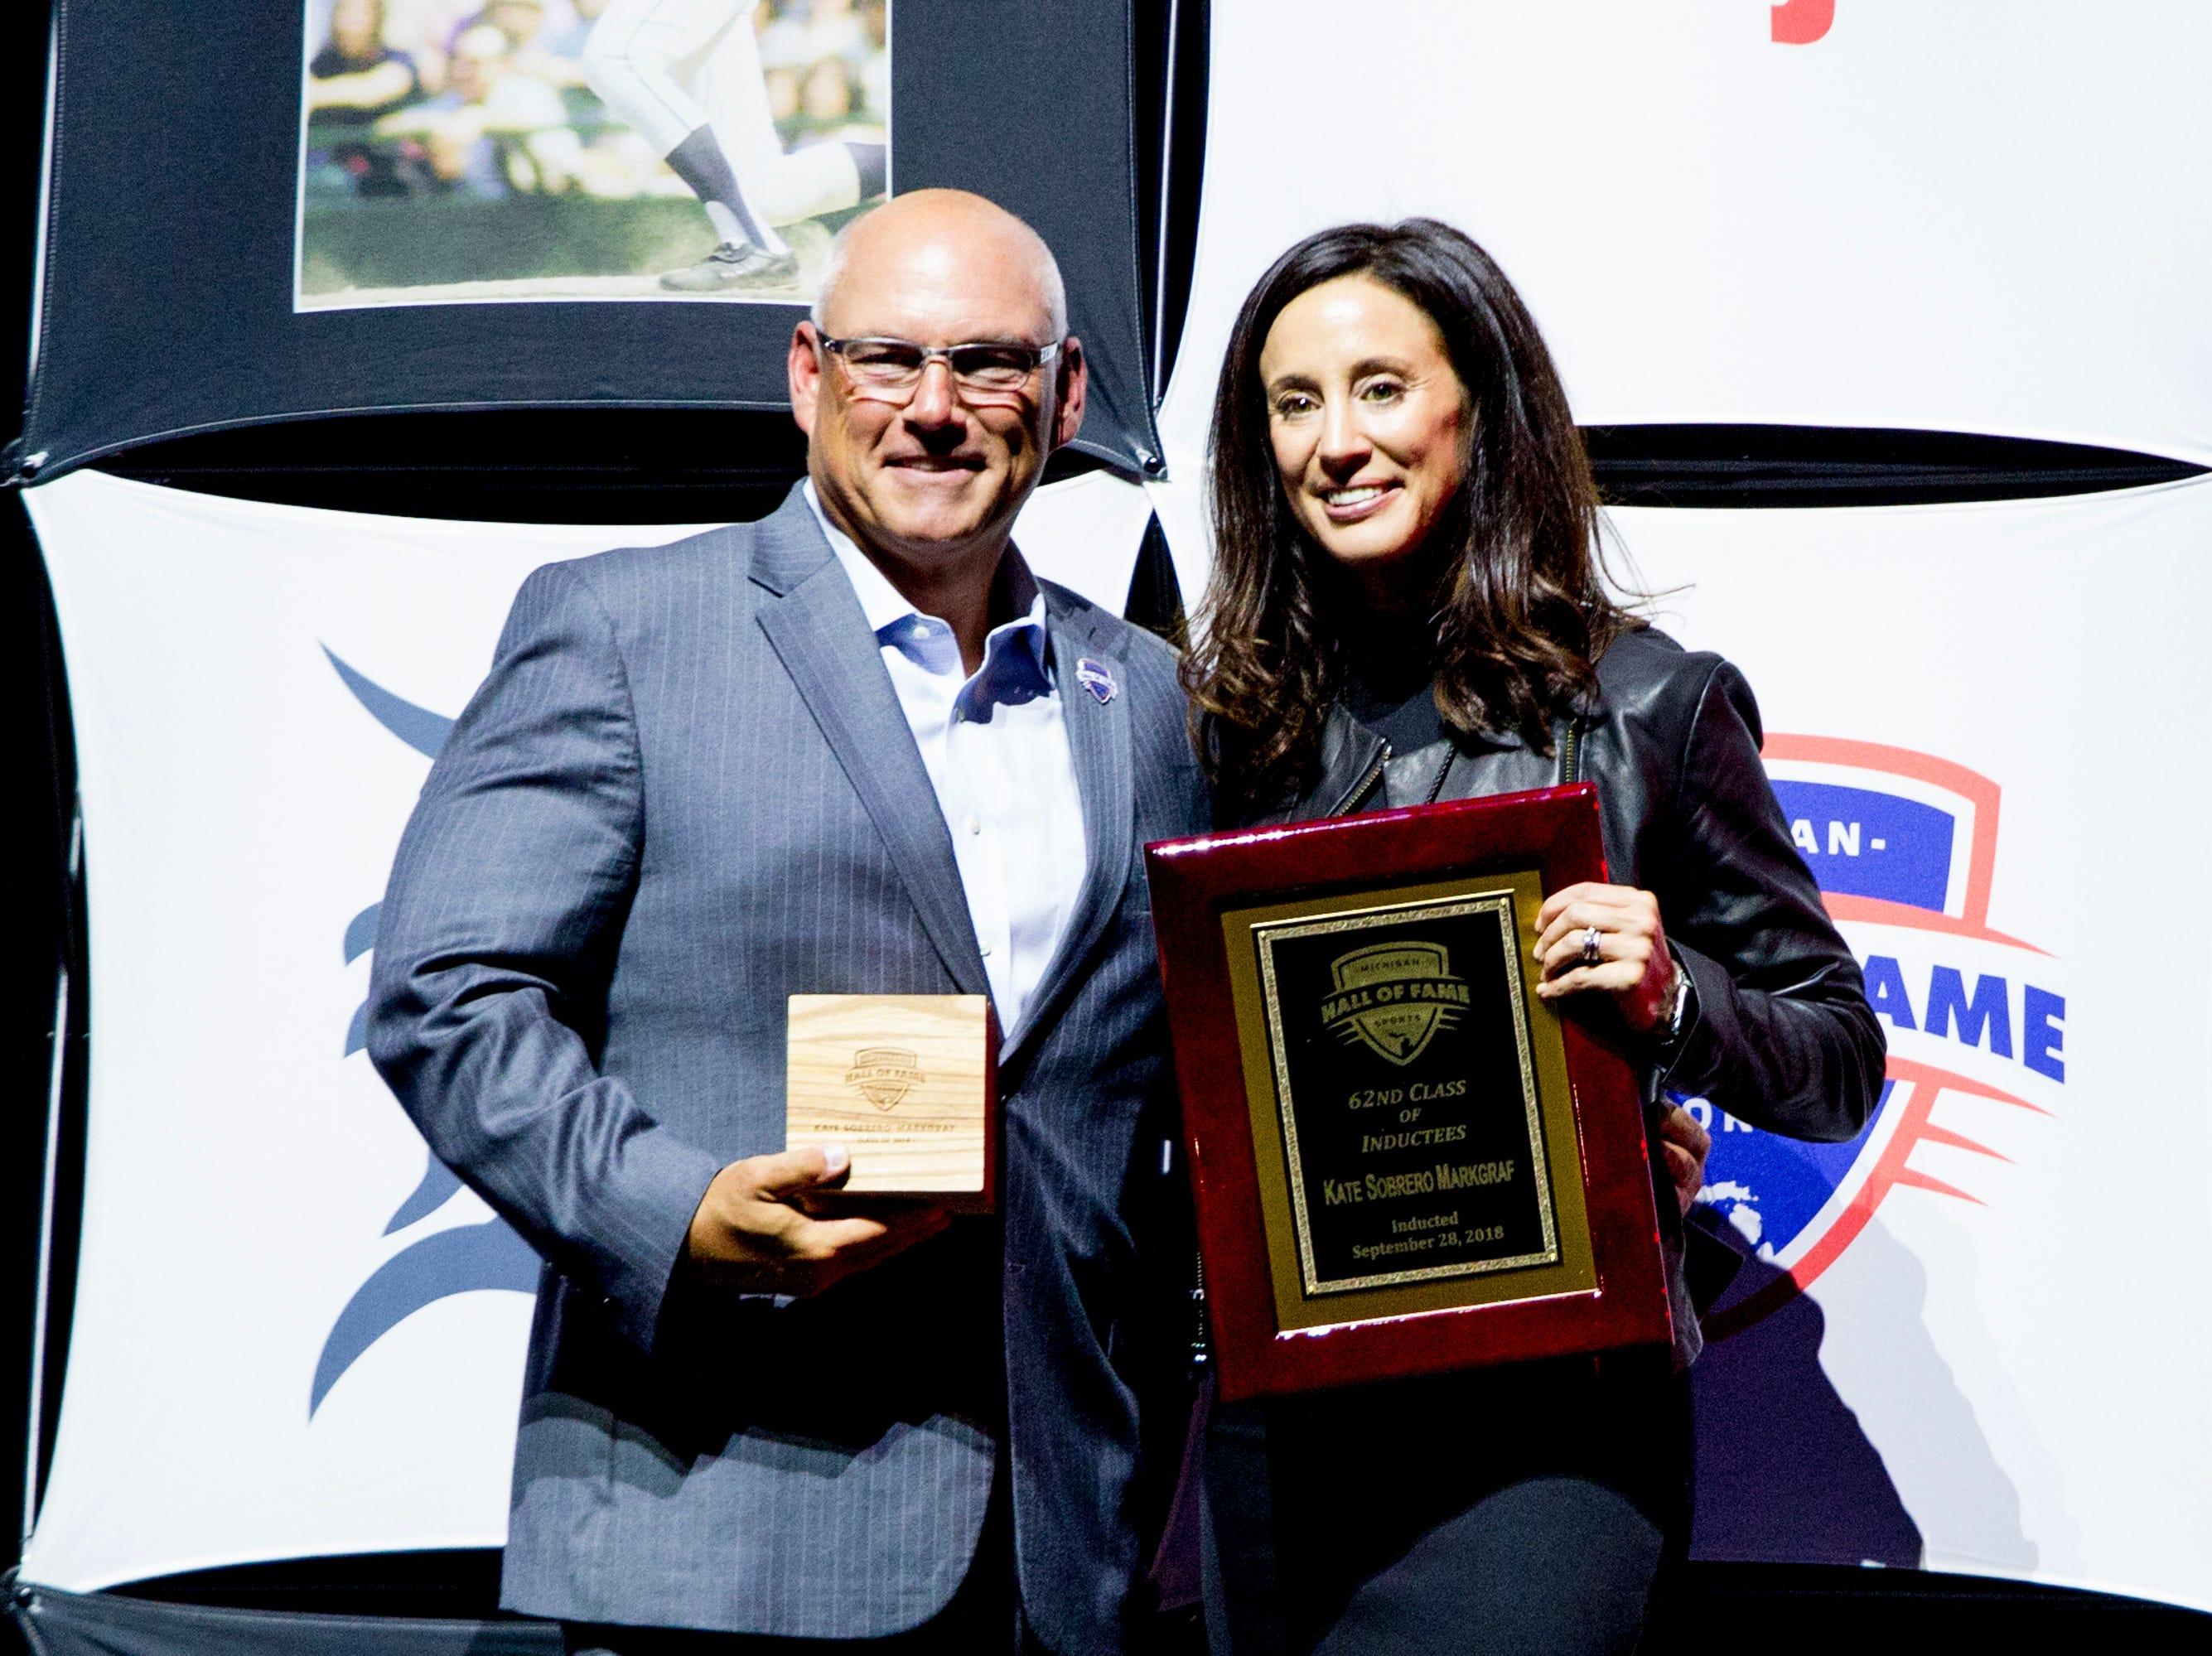 Soccer great Kate Sobrero Markgraf  receives her award.